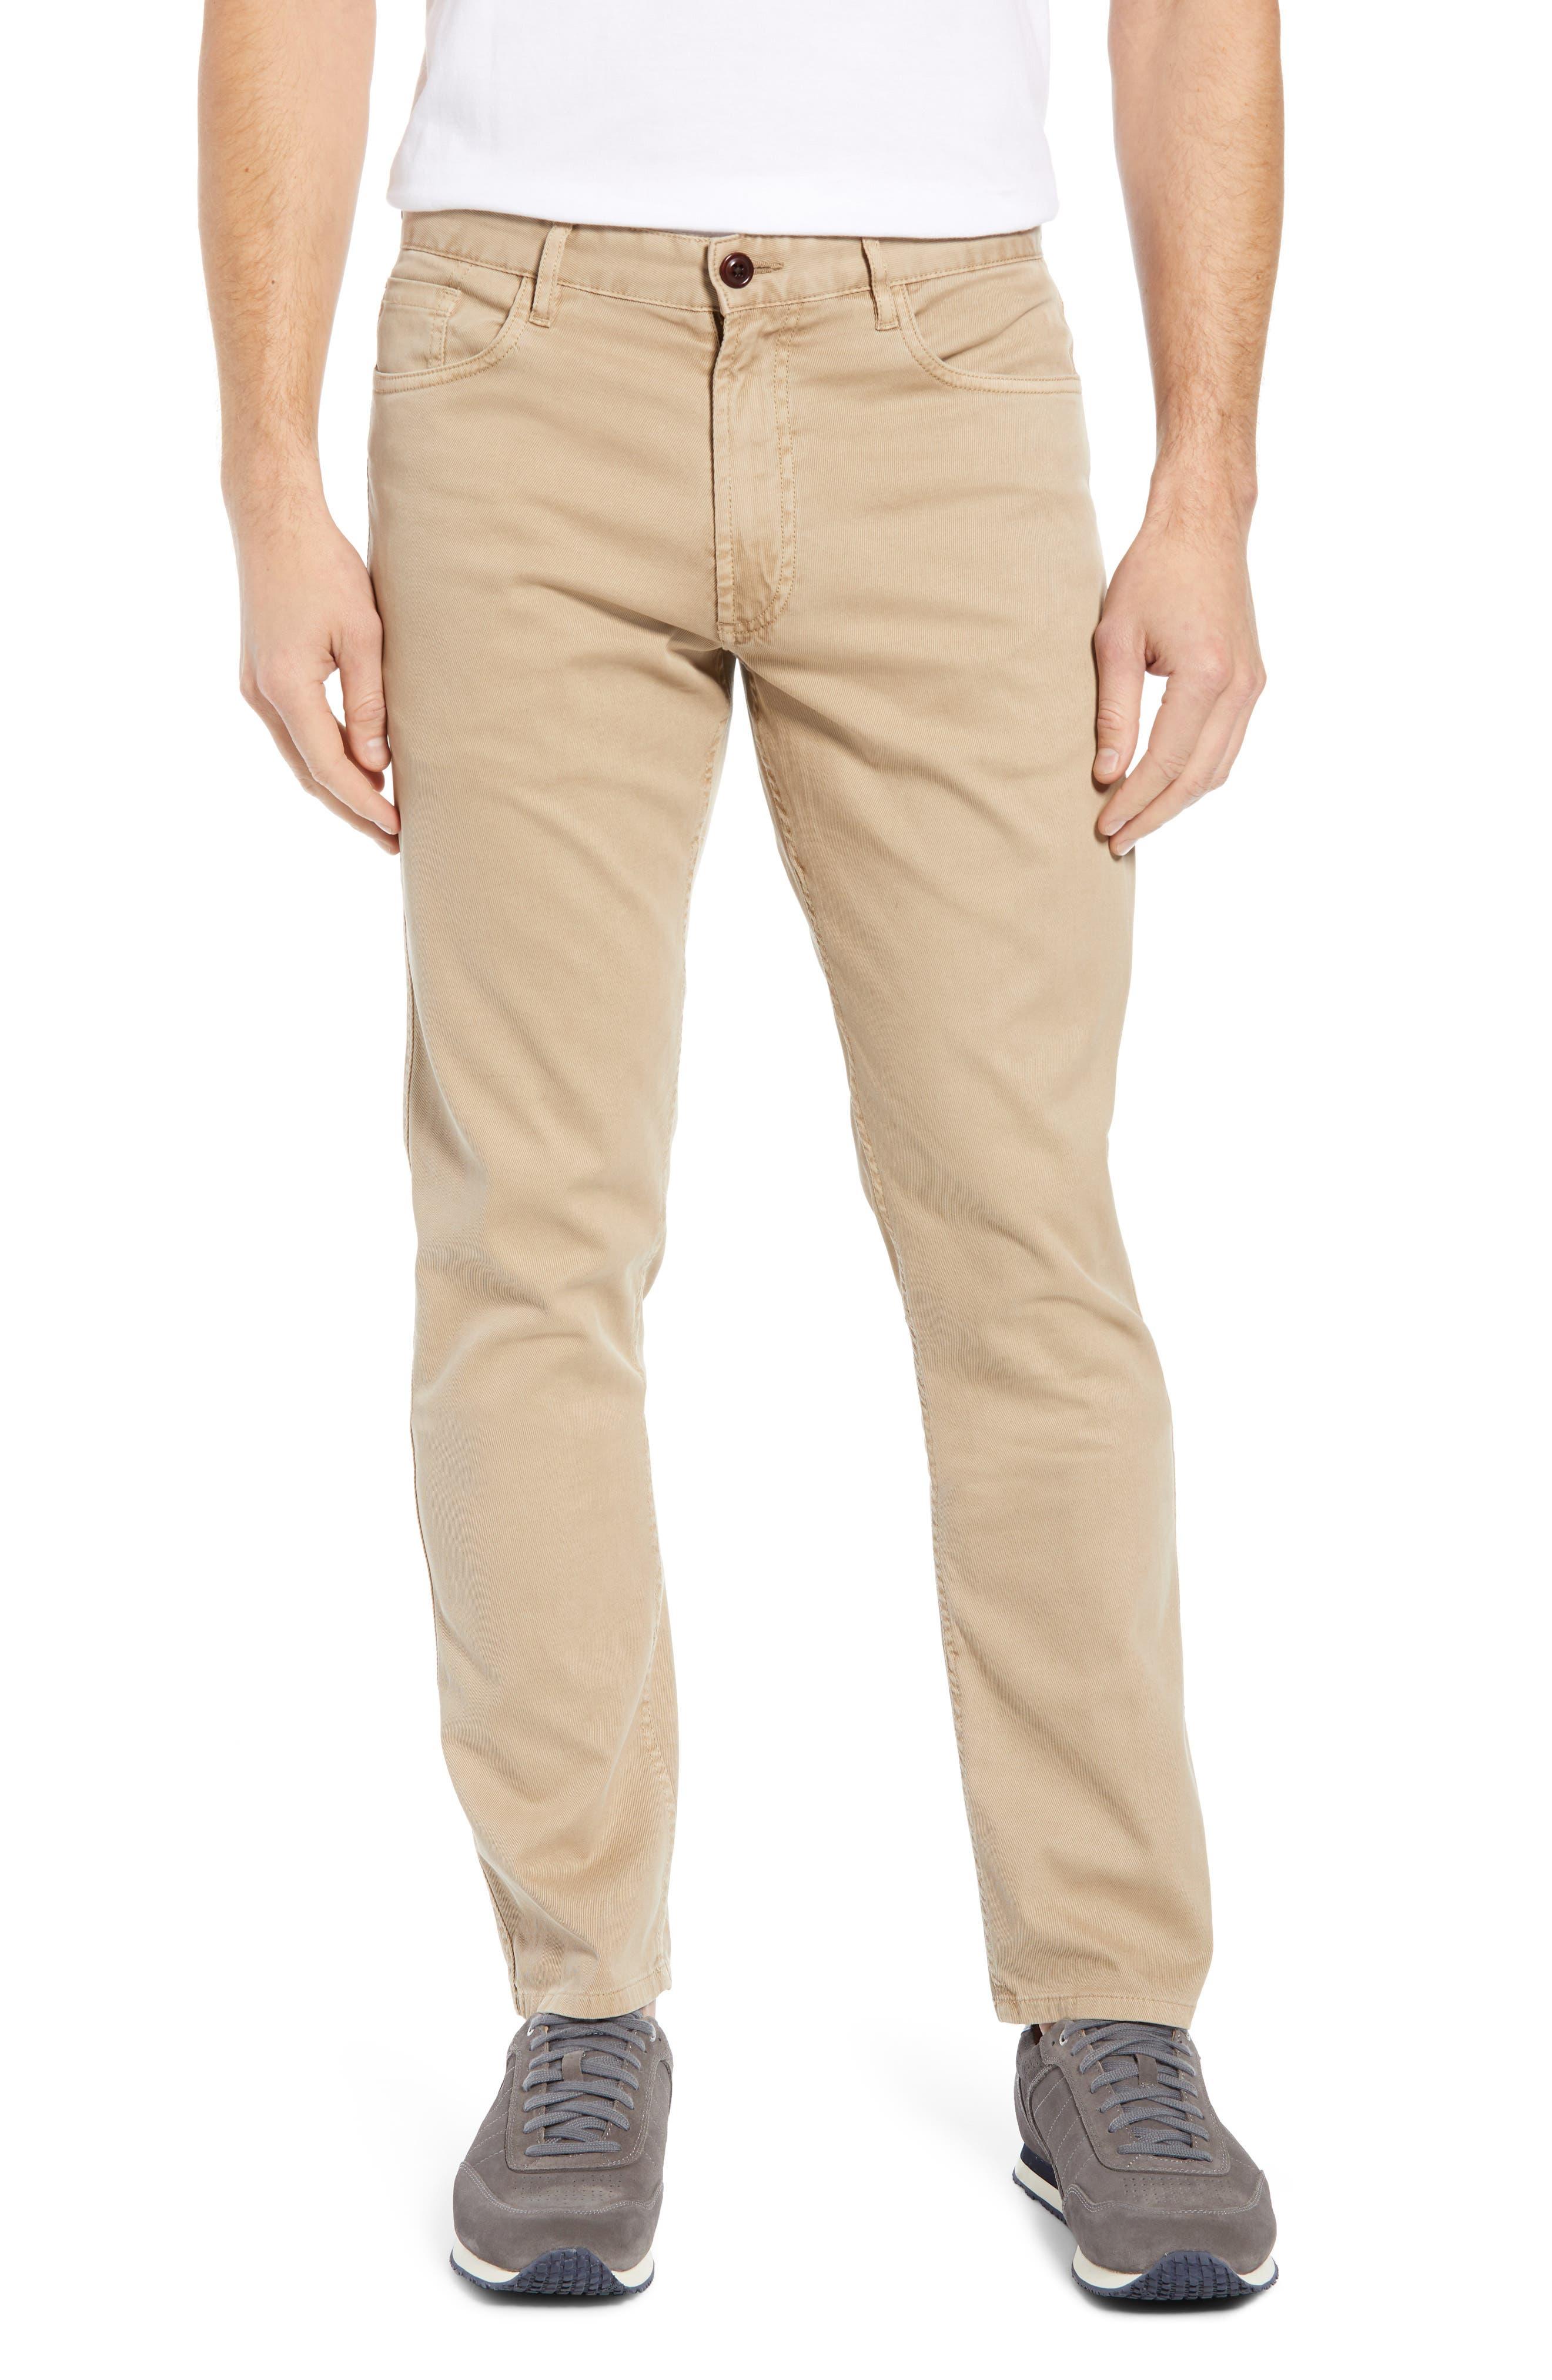 Faherty Comfort Twill Straight Leg Five-Pocket Pants, Beige